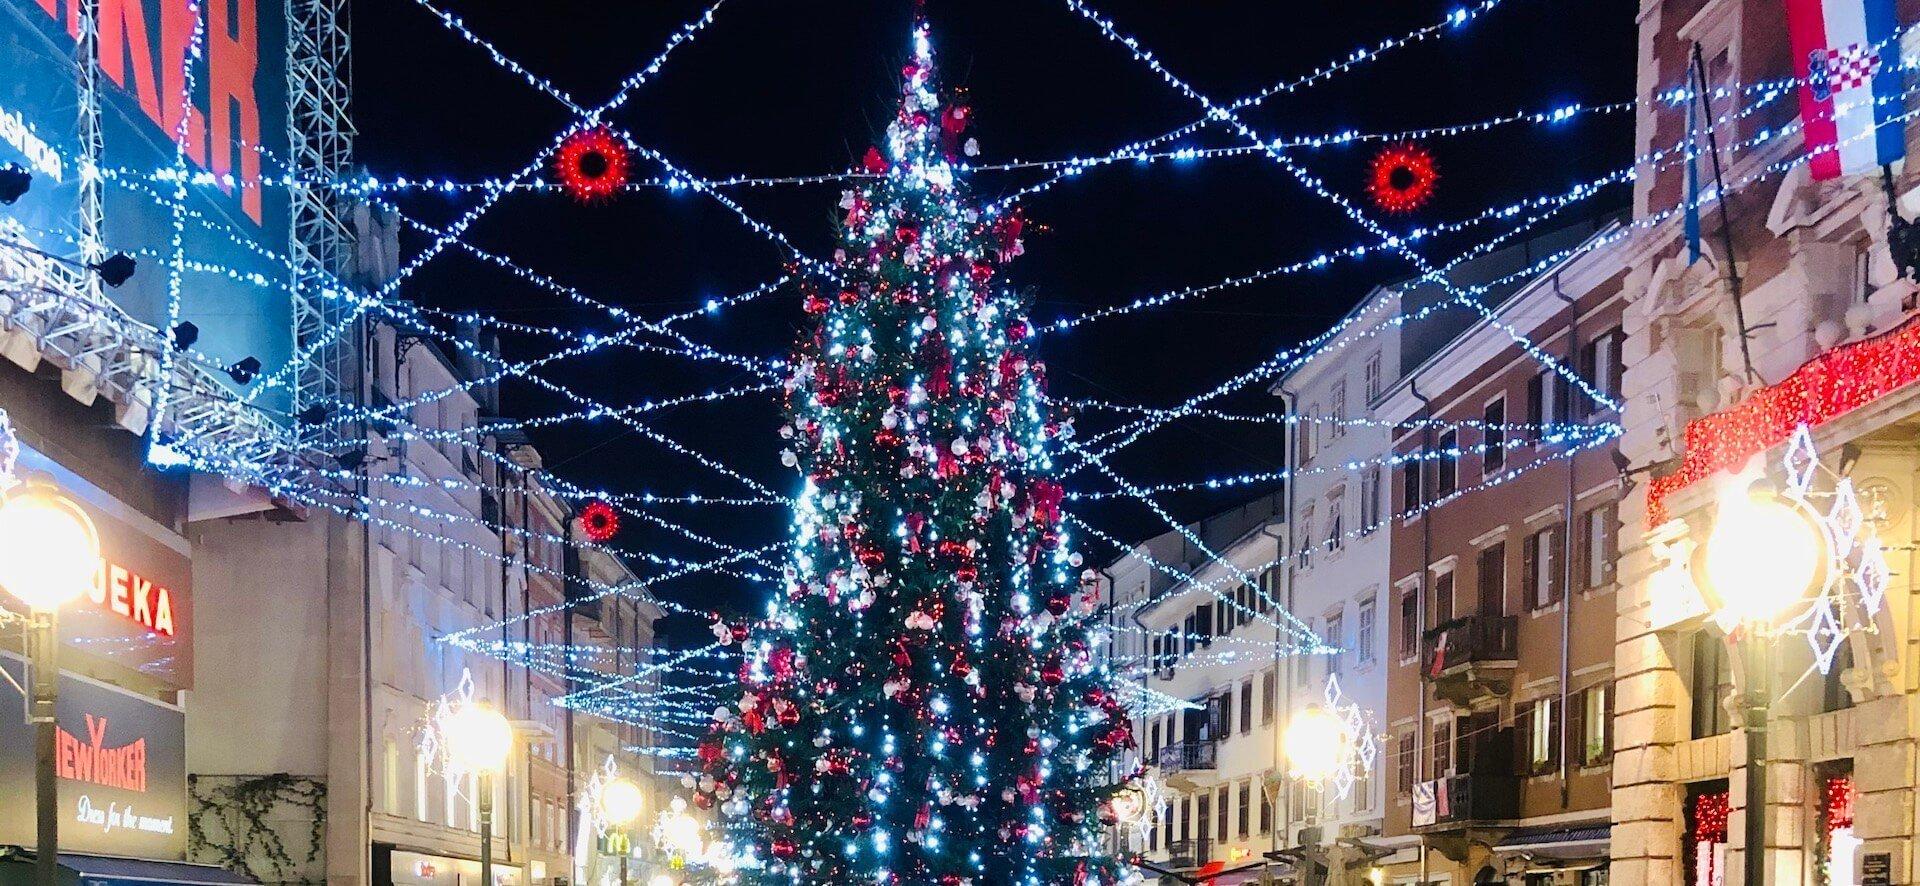 Advent Rijeka Christmas New Year